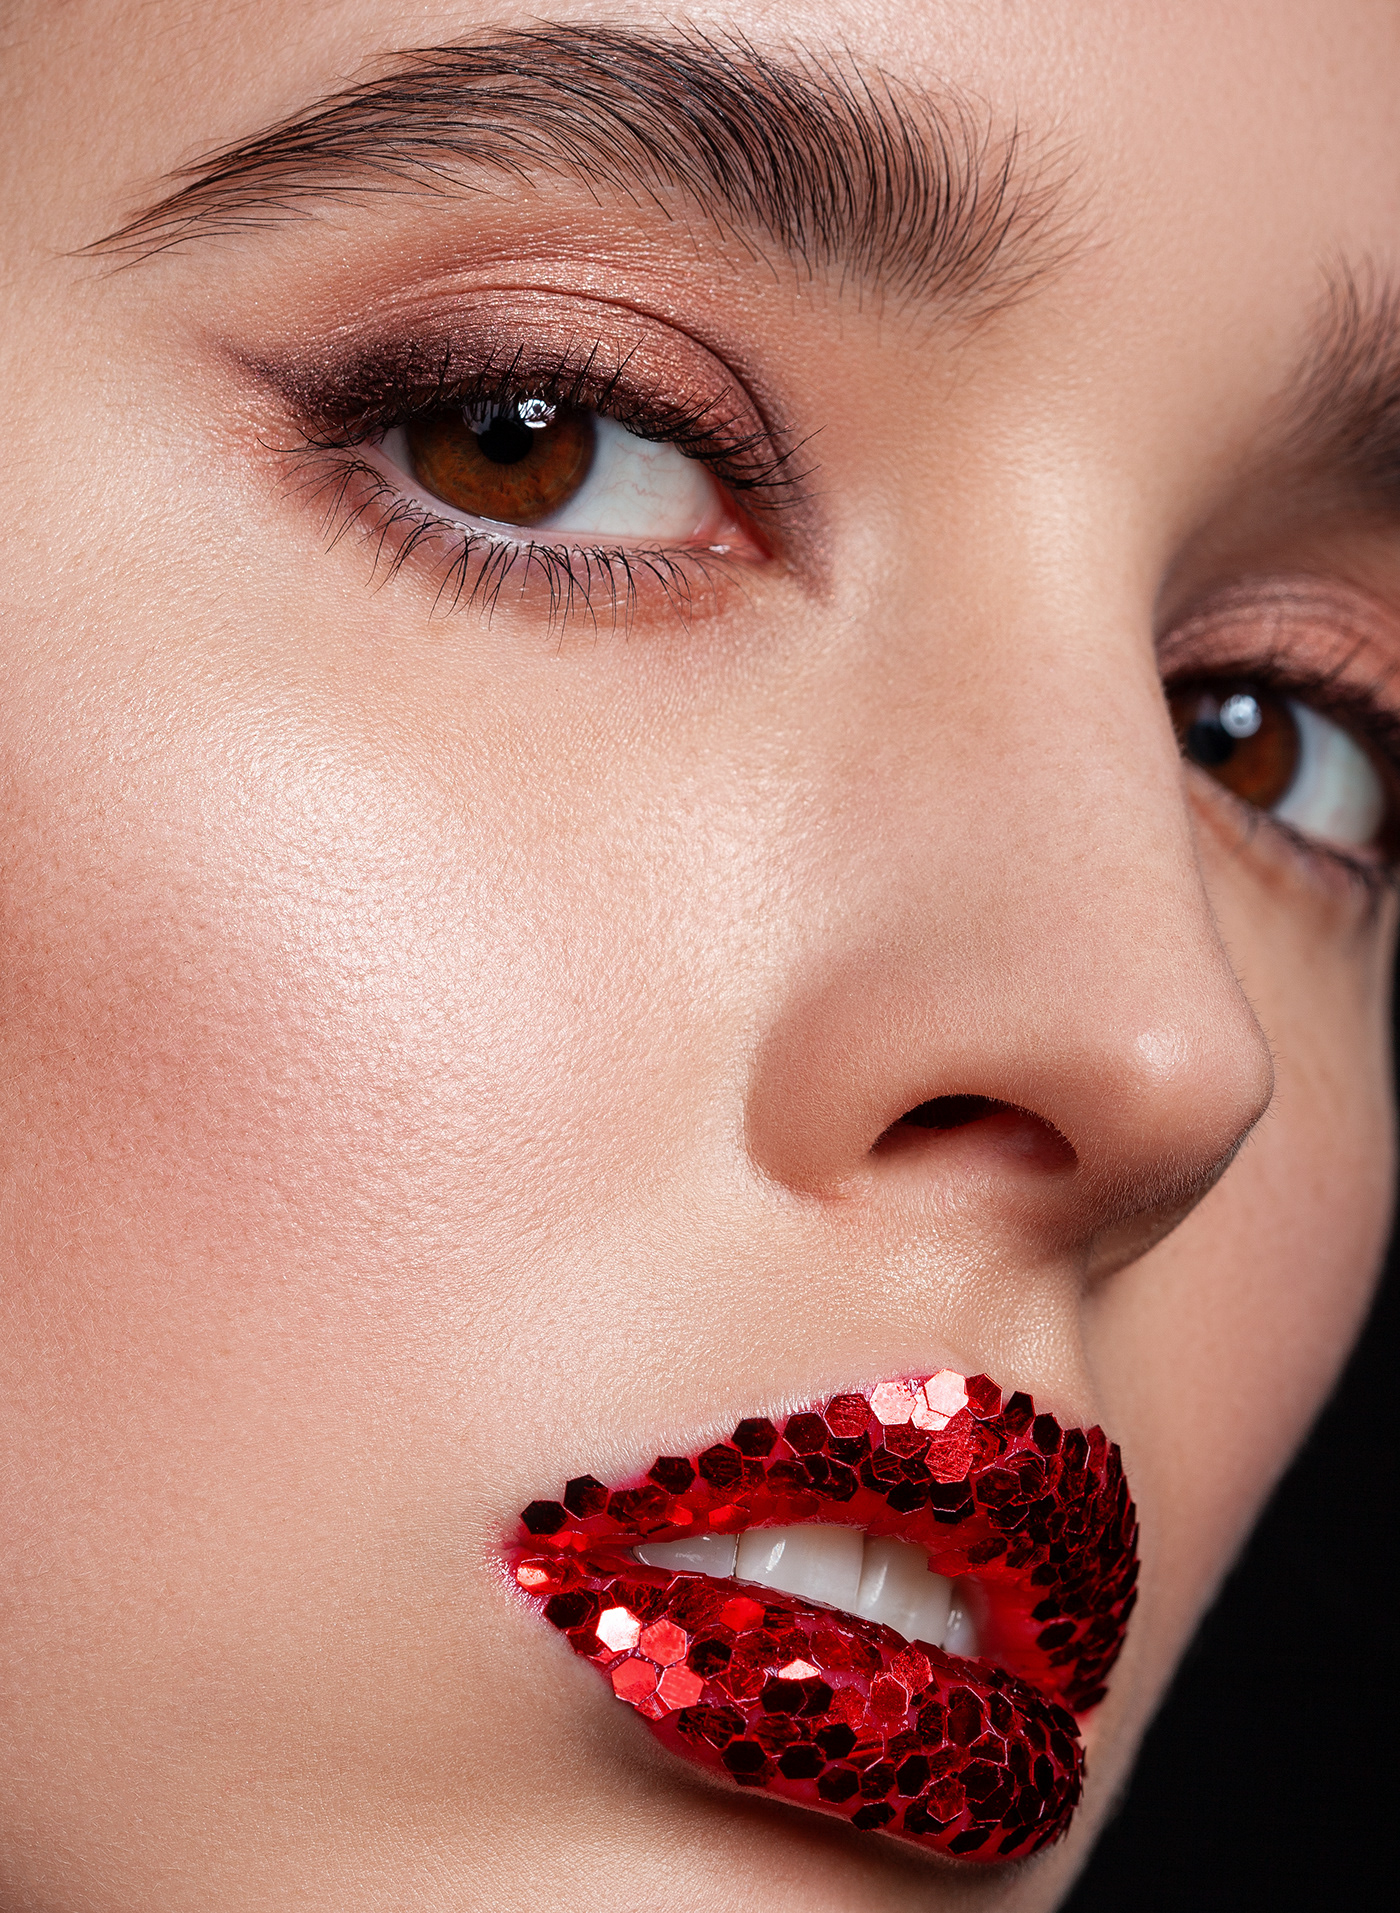 beauty beautyphotography beautyretoucher hiendretouch retouch retouching  skinretouch skinretouching